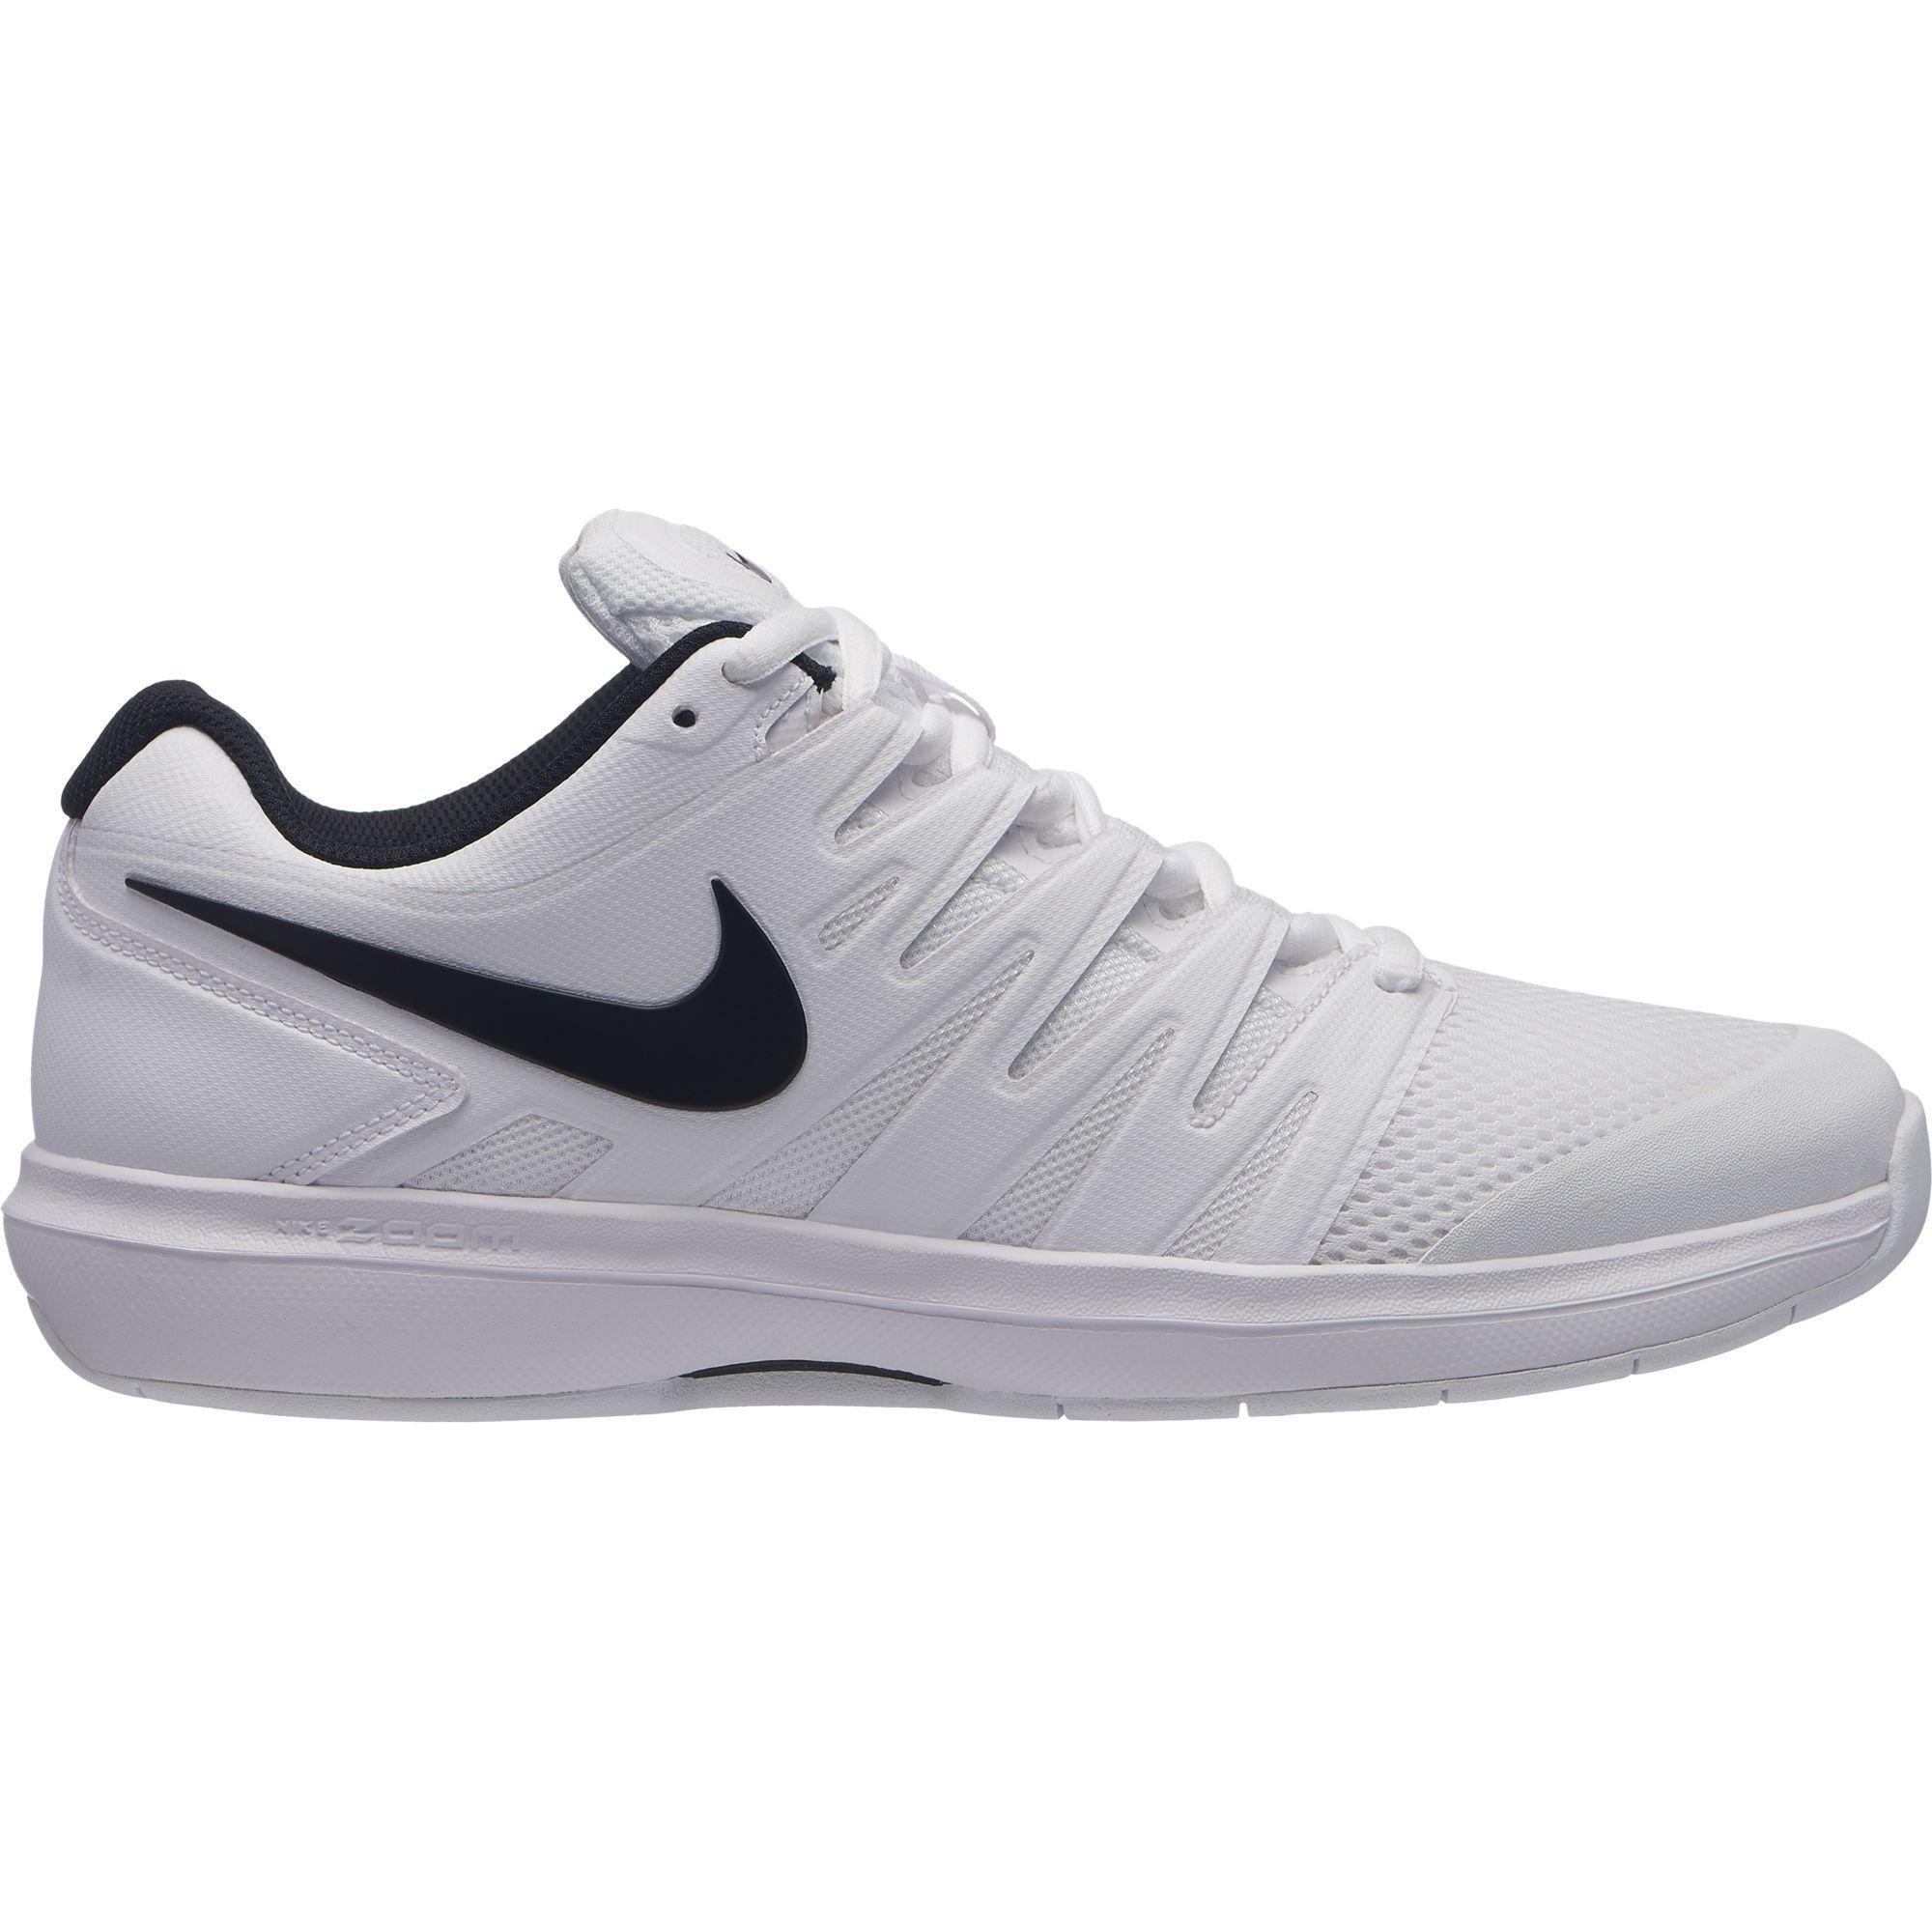 21c9e81eee Nike Kids Air Zoom Prestige Tennis Shoes - Carpet White/Black -  Tennisnuts.com